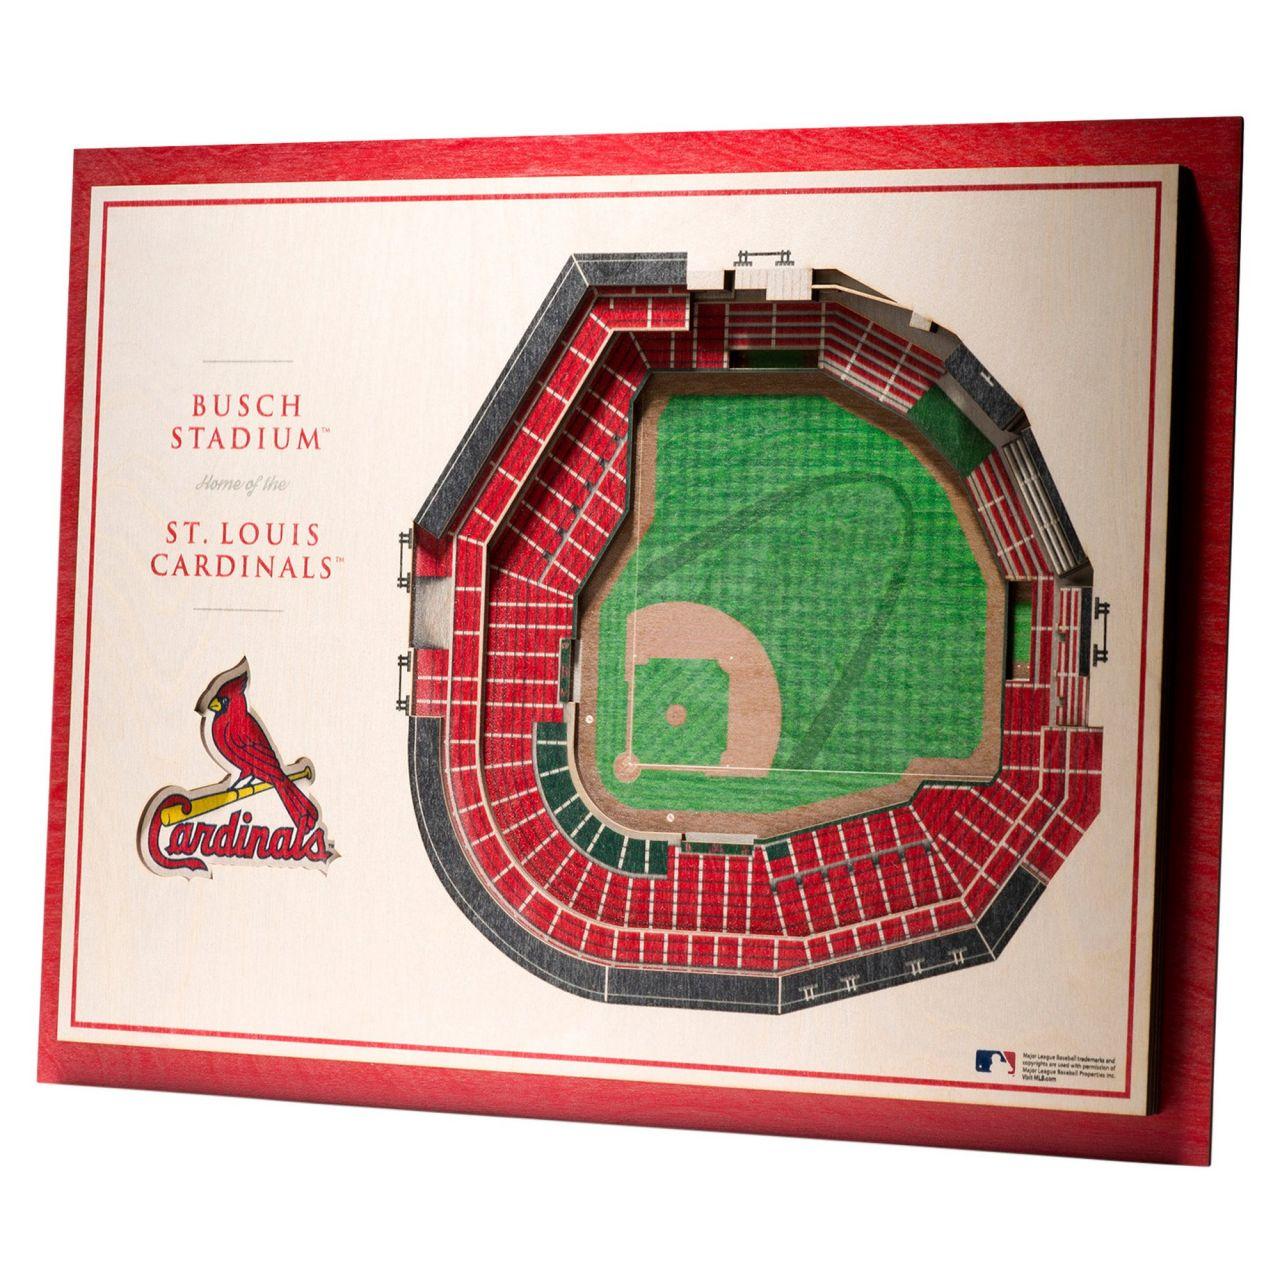 amfoo - YouTheFan Holz Wanddeko Stadion St. Louis Cardinals 43x33cm